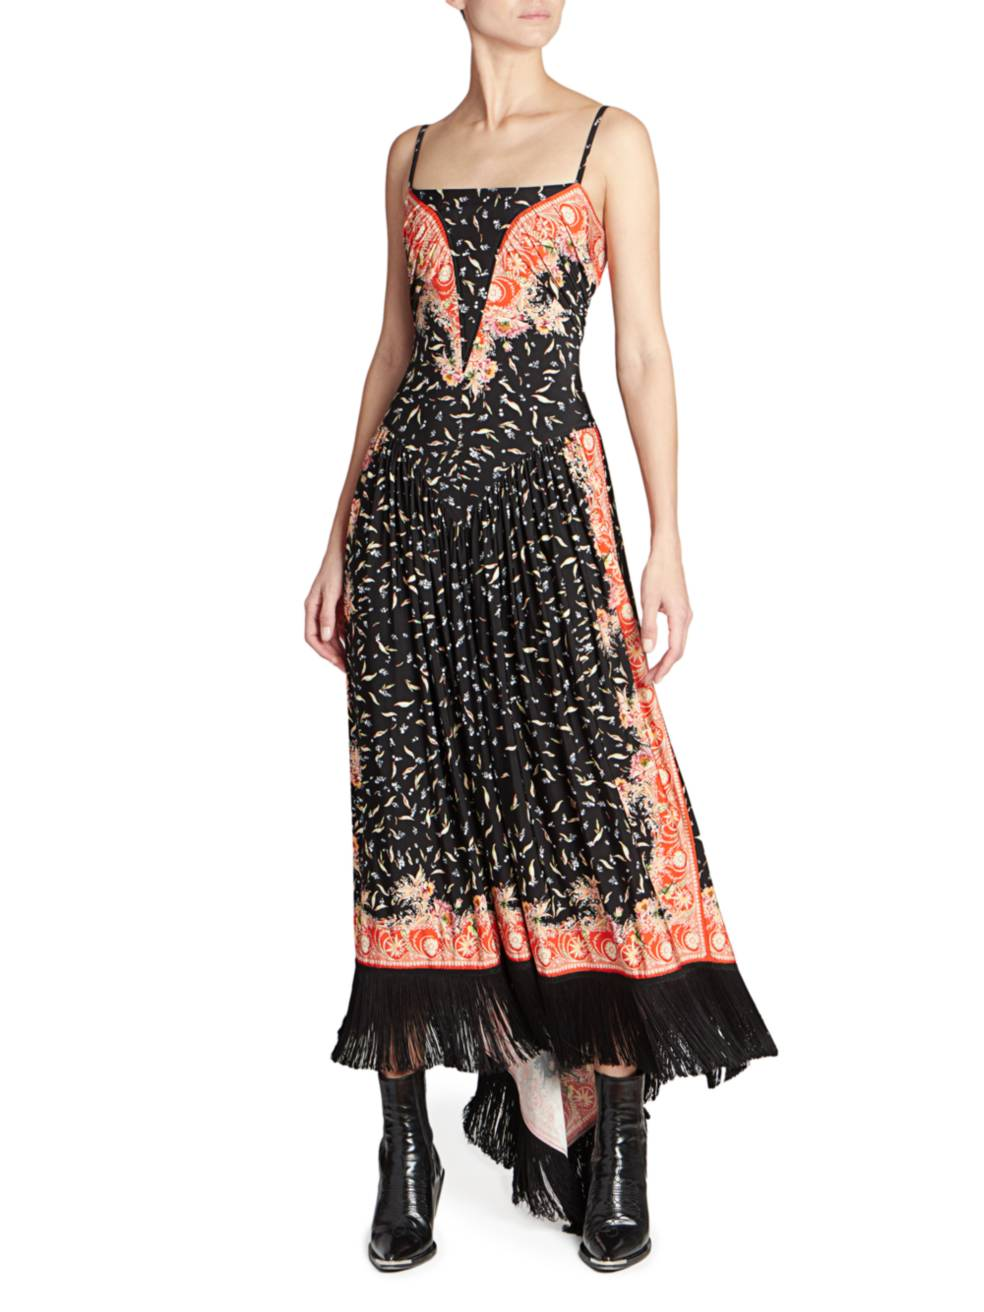 PACO RABANNE Printed Fringe Slip Dress